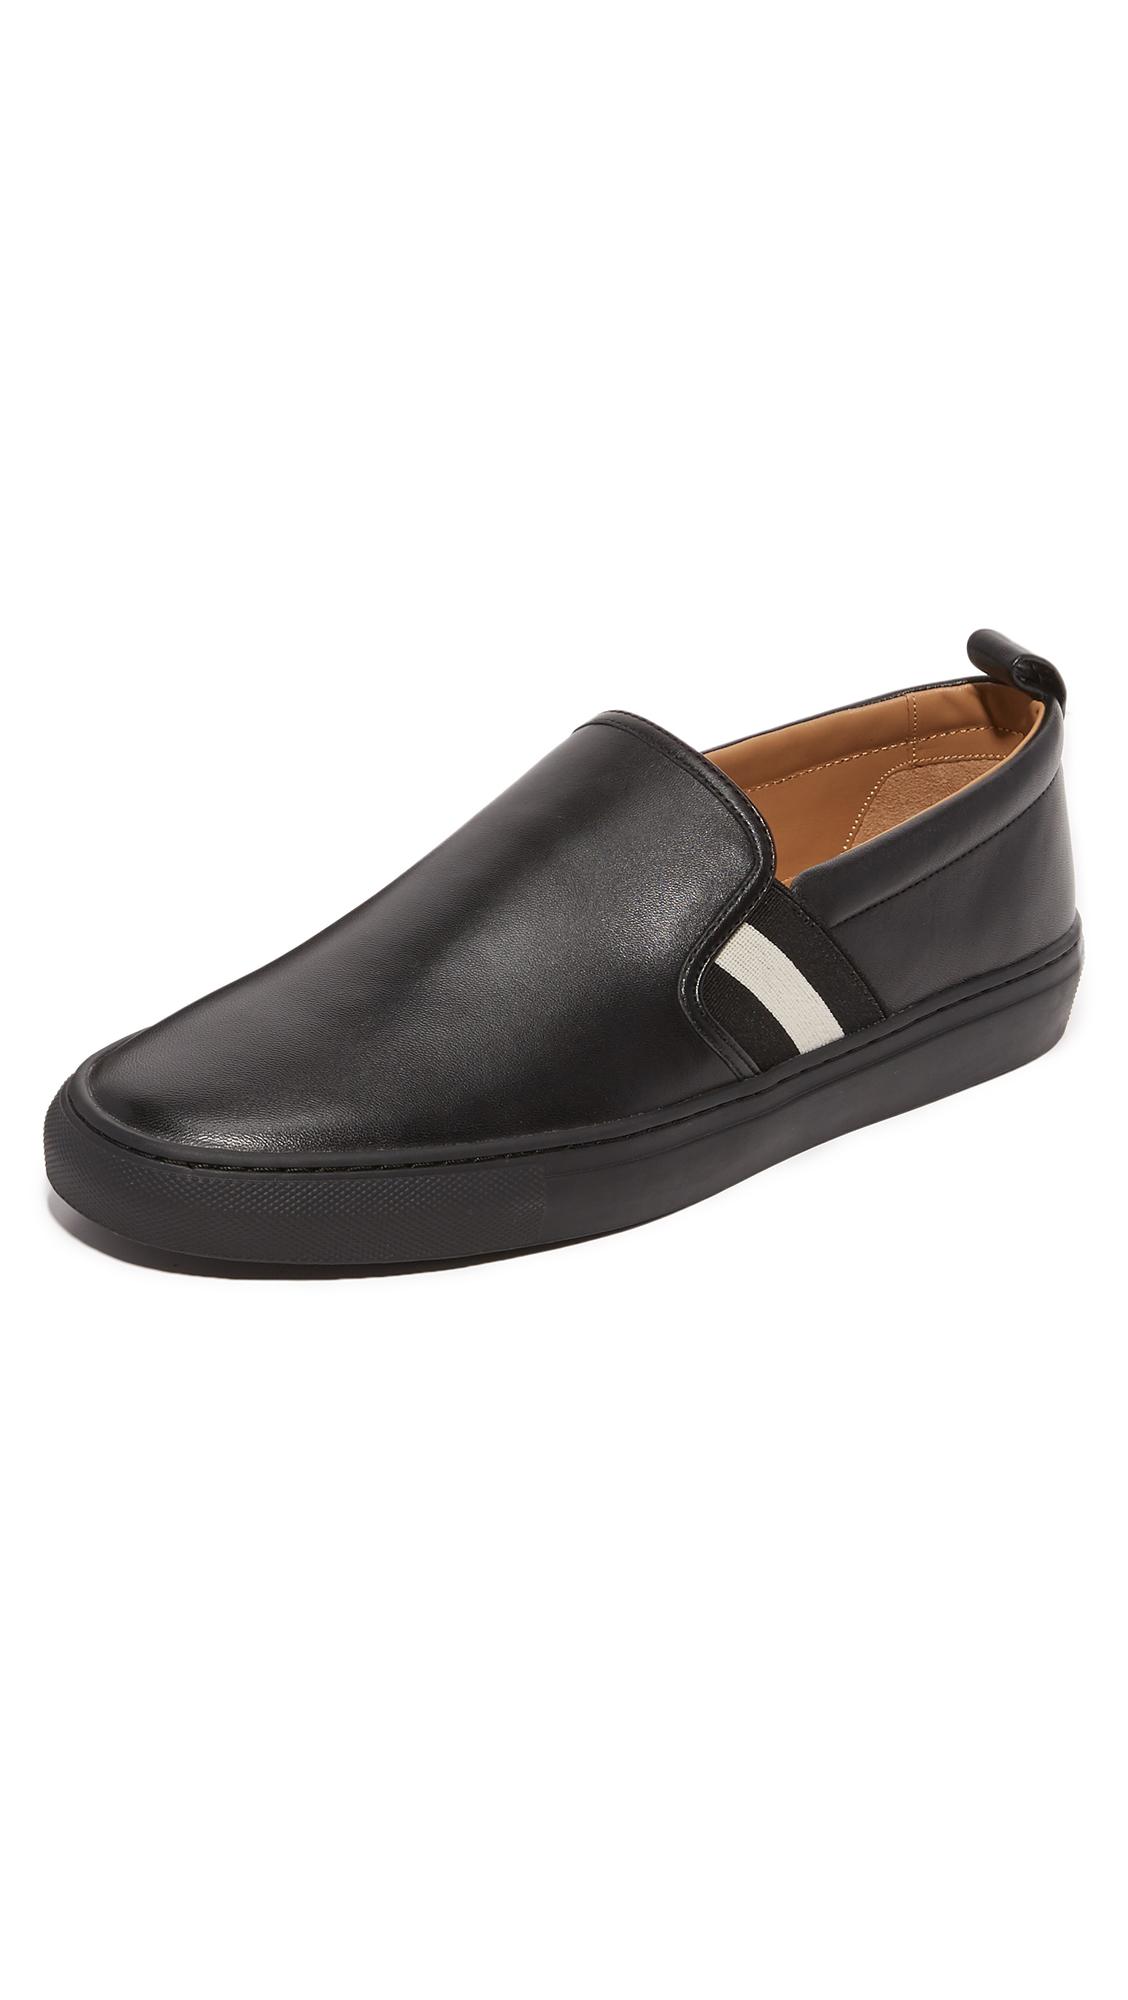 Bally Herald Slip On Sneakers